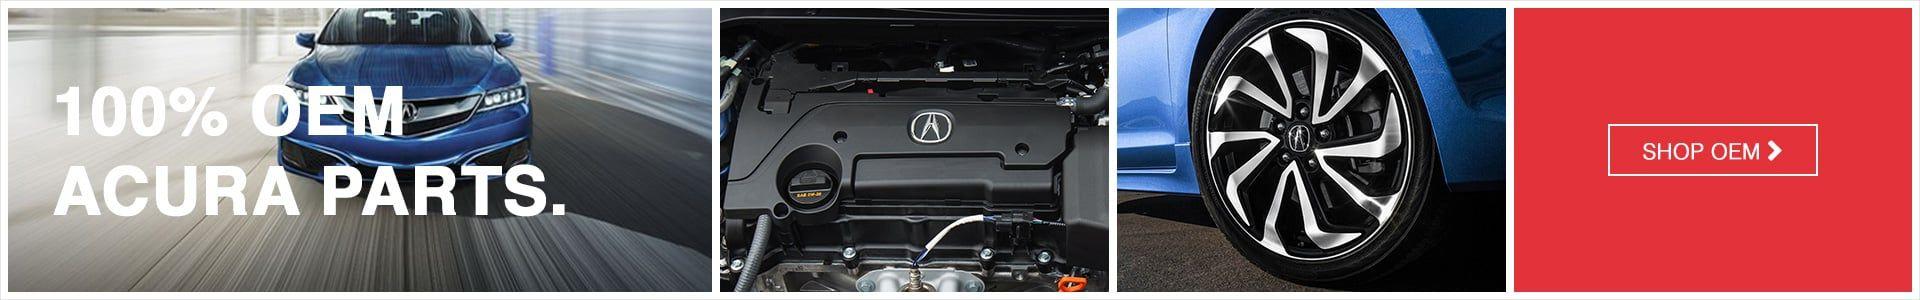 Acura Oem Parts >> Shop Acura Oem Parts Accessories Online Ferman Acura Parts